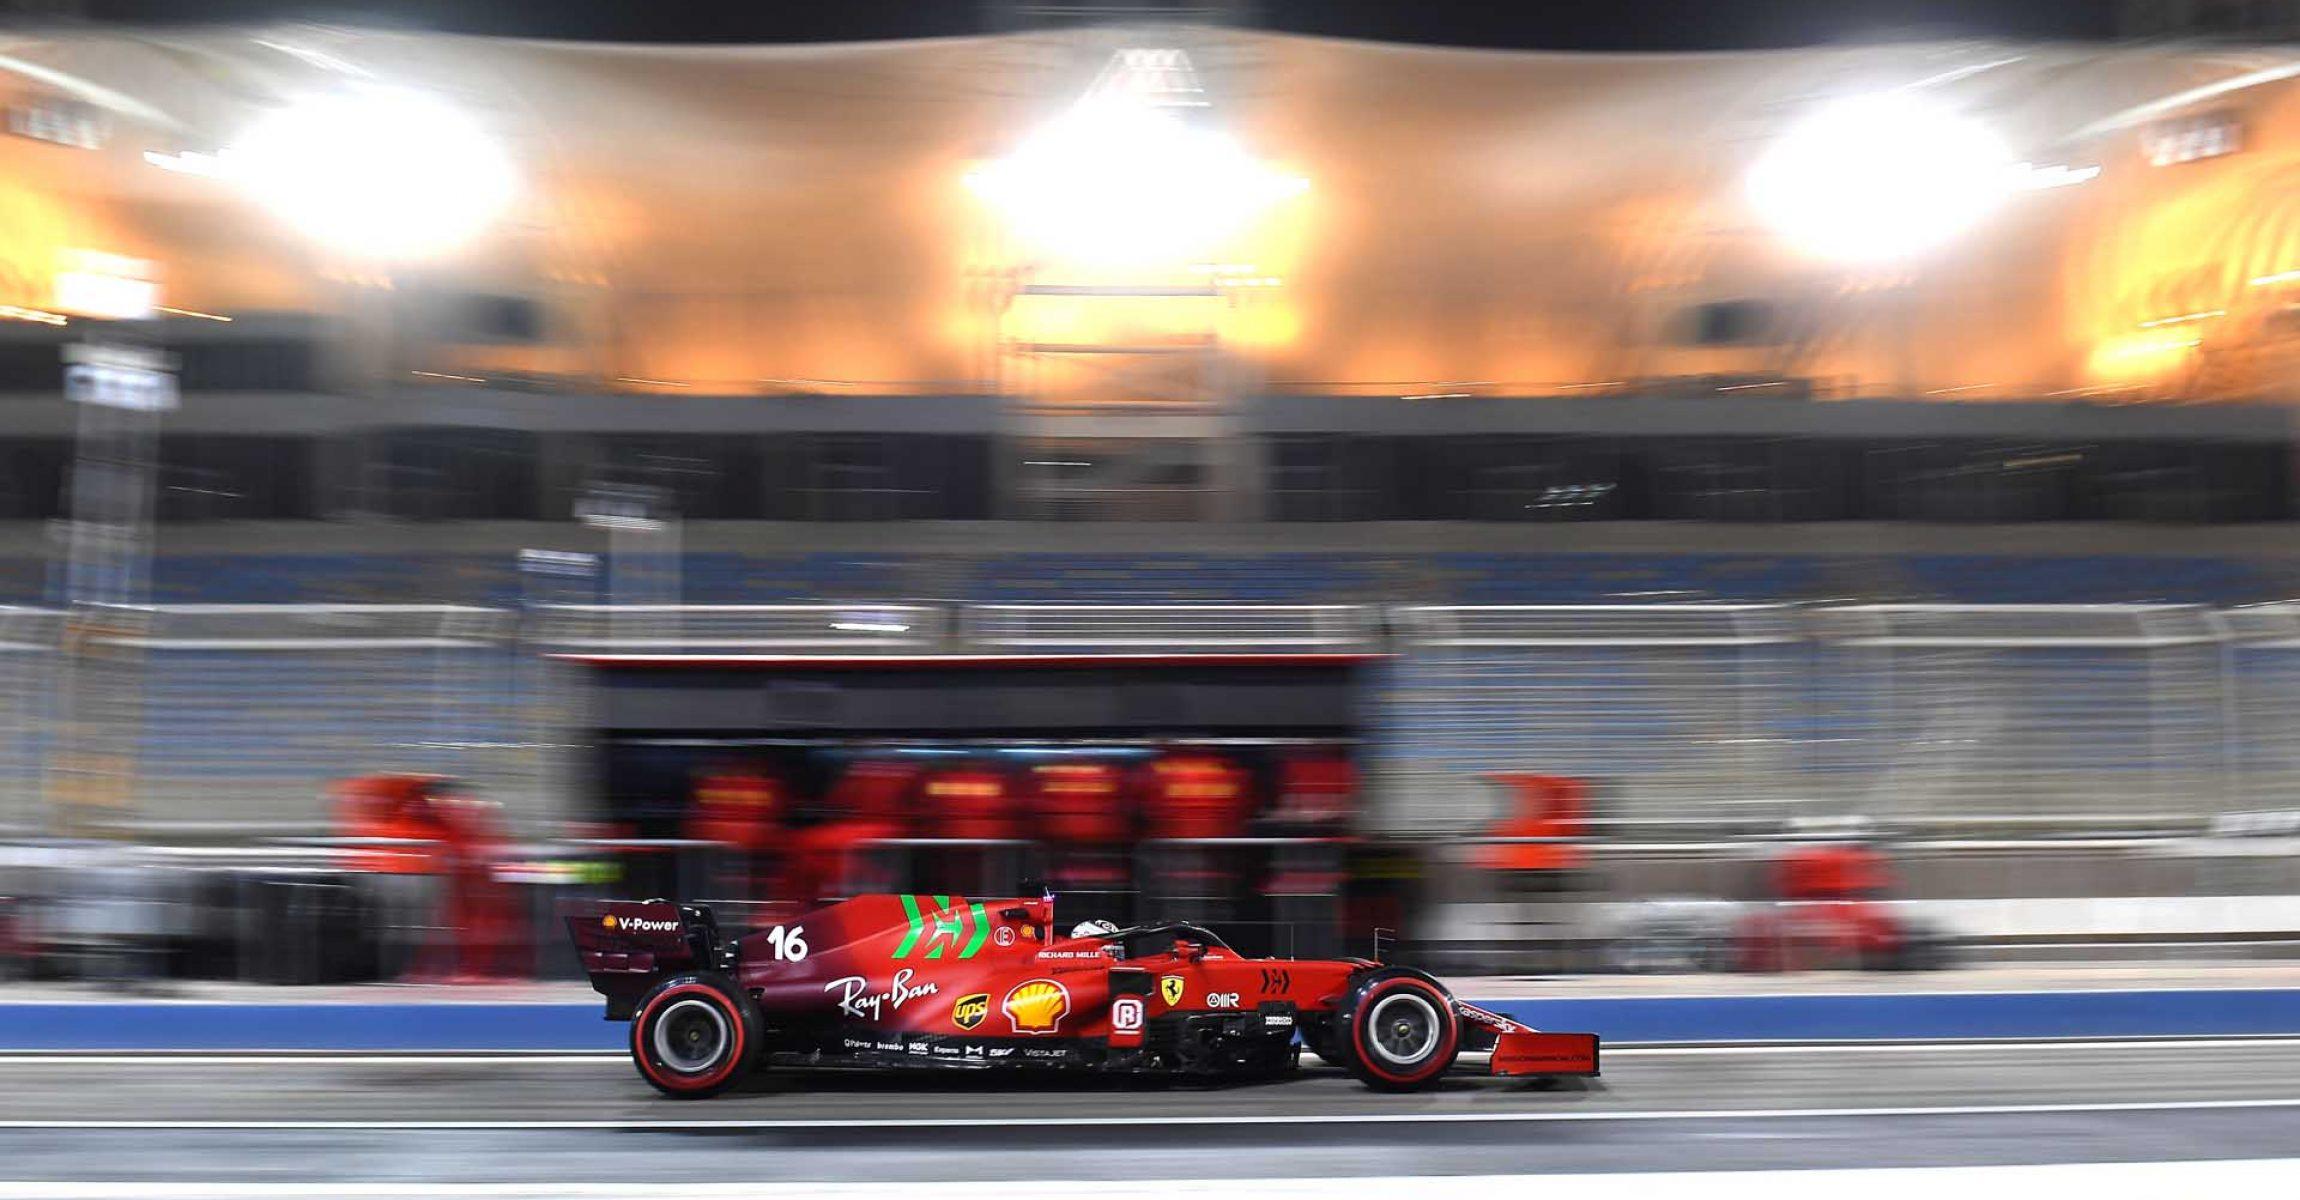 FERRARI F1 TEST BAHRAIN - SABATO 13/03/2021 credit: @Scuderia Ferrari Press Office Charles Leclerc